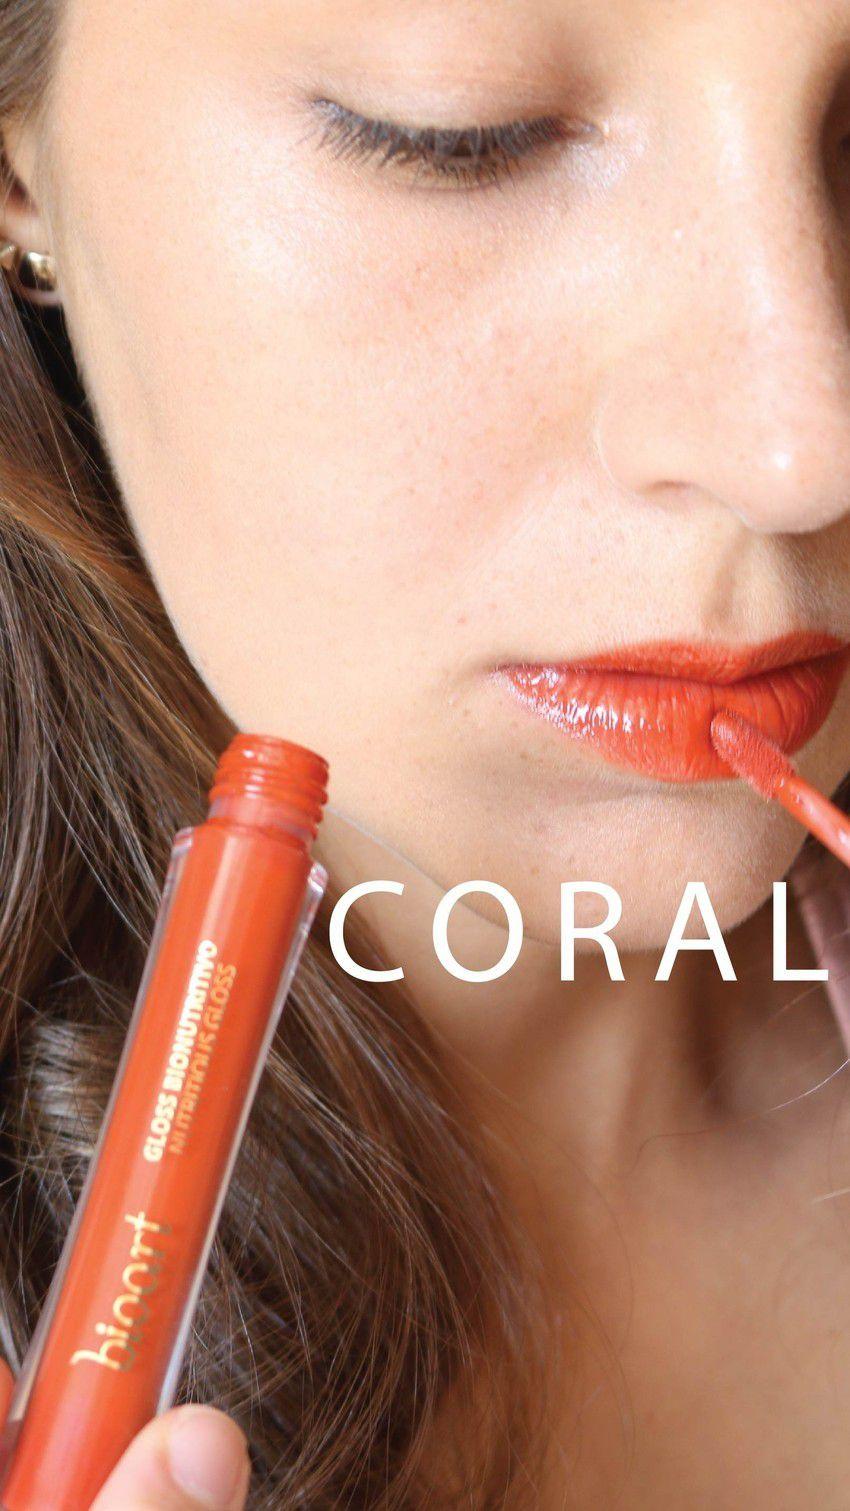 Gloss Bionutritivo Bioart Coral - 4ml